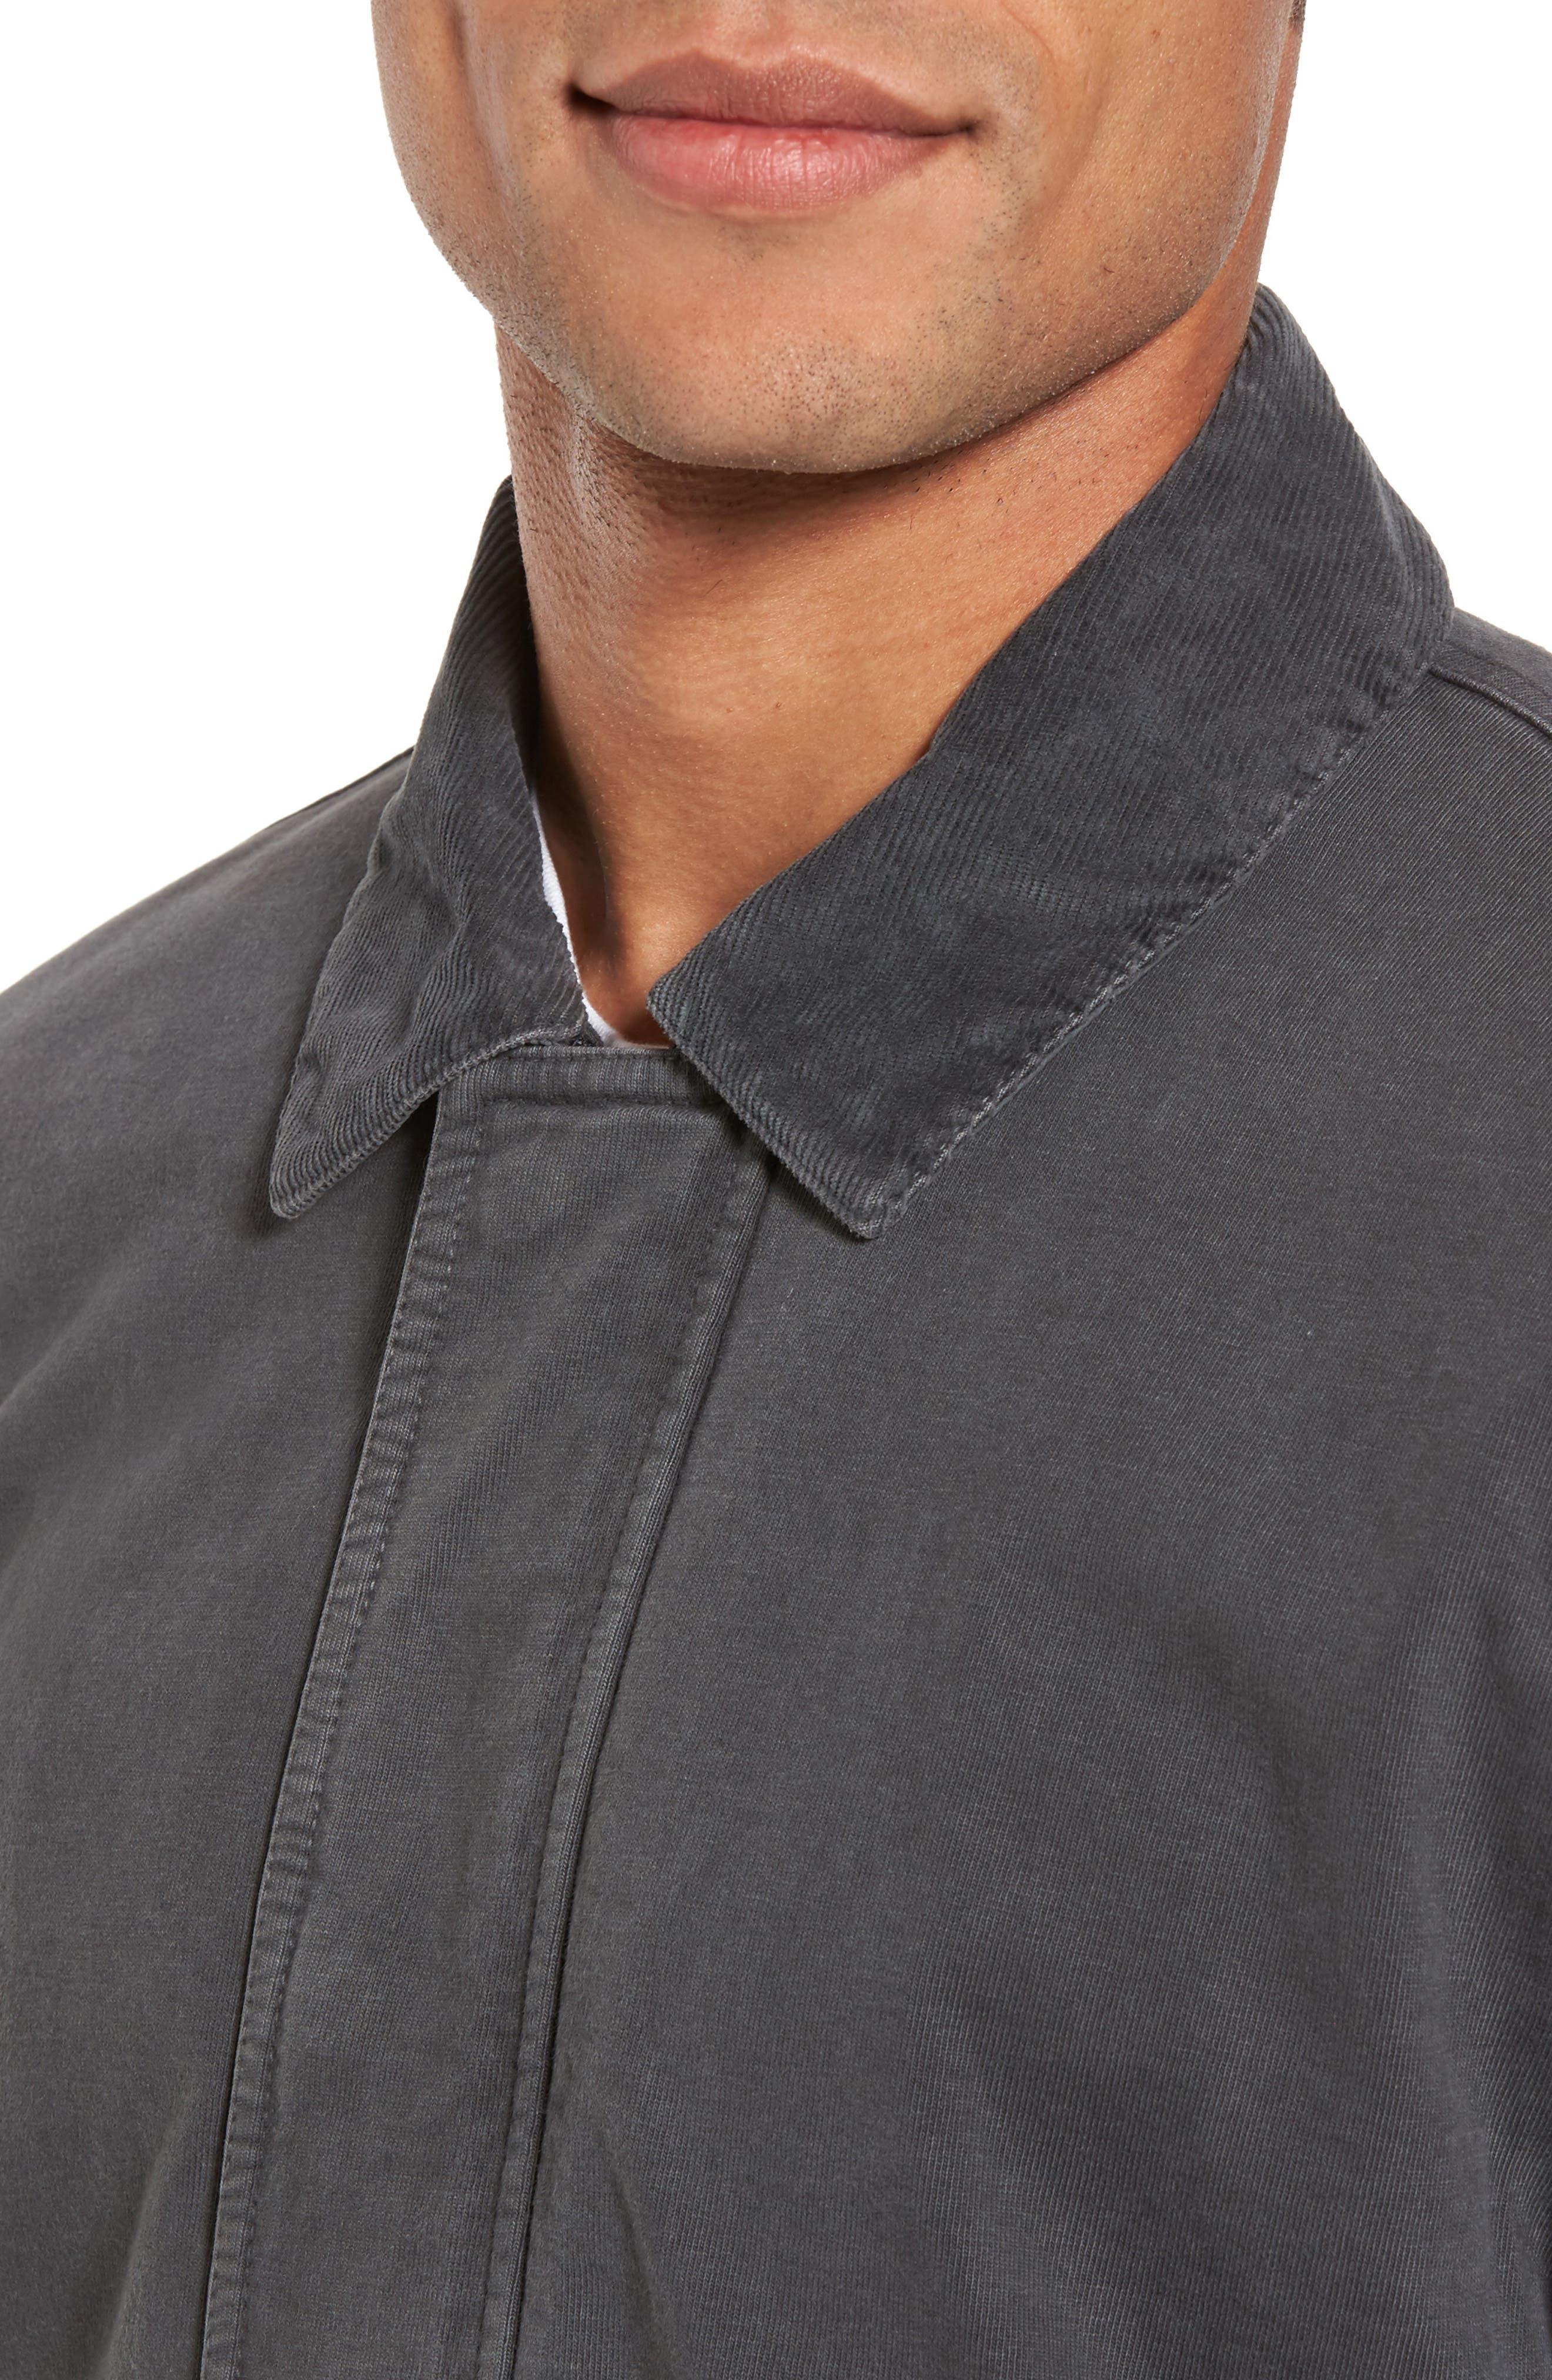 Garment Dyed Field Jacket,                             Alternate thumbnail 4, color,                             Carbon Pigment